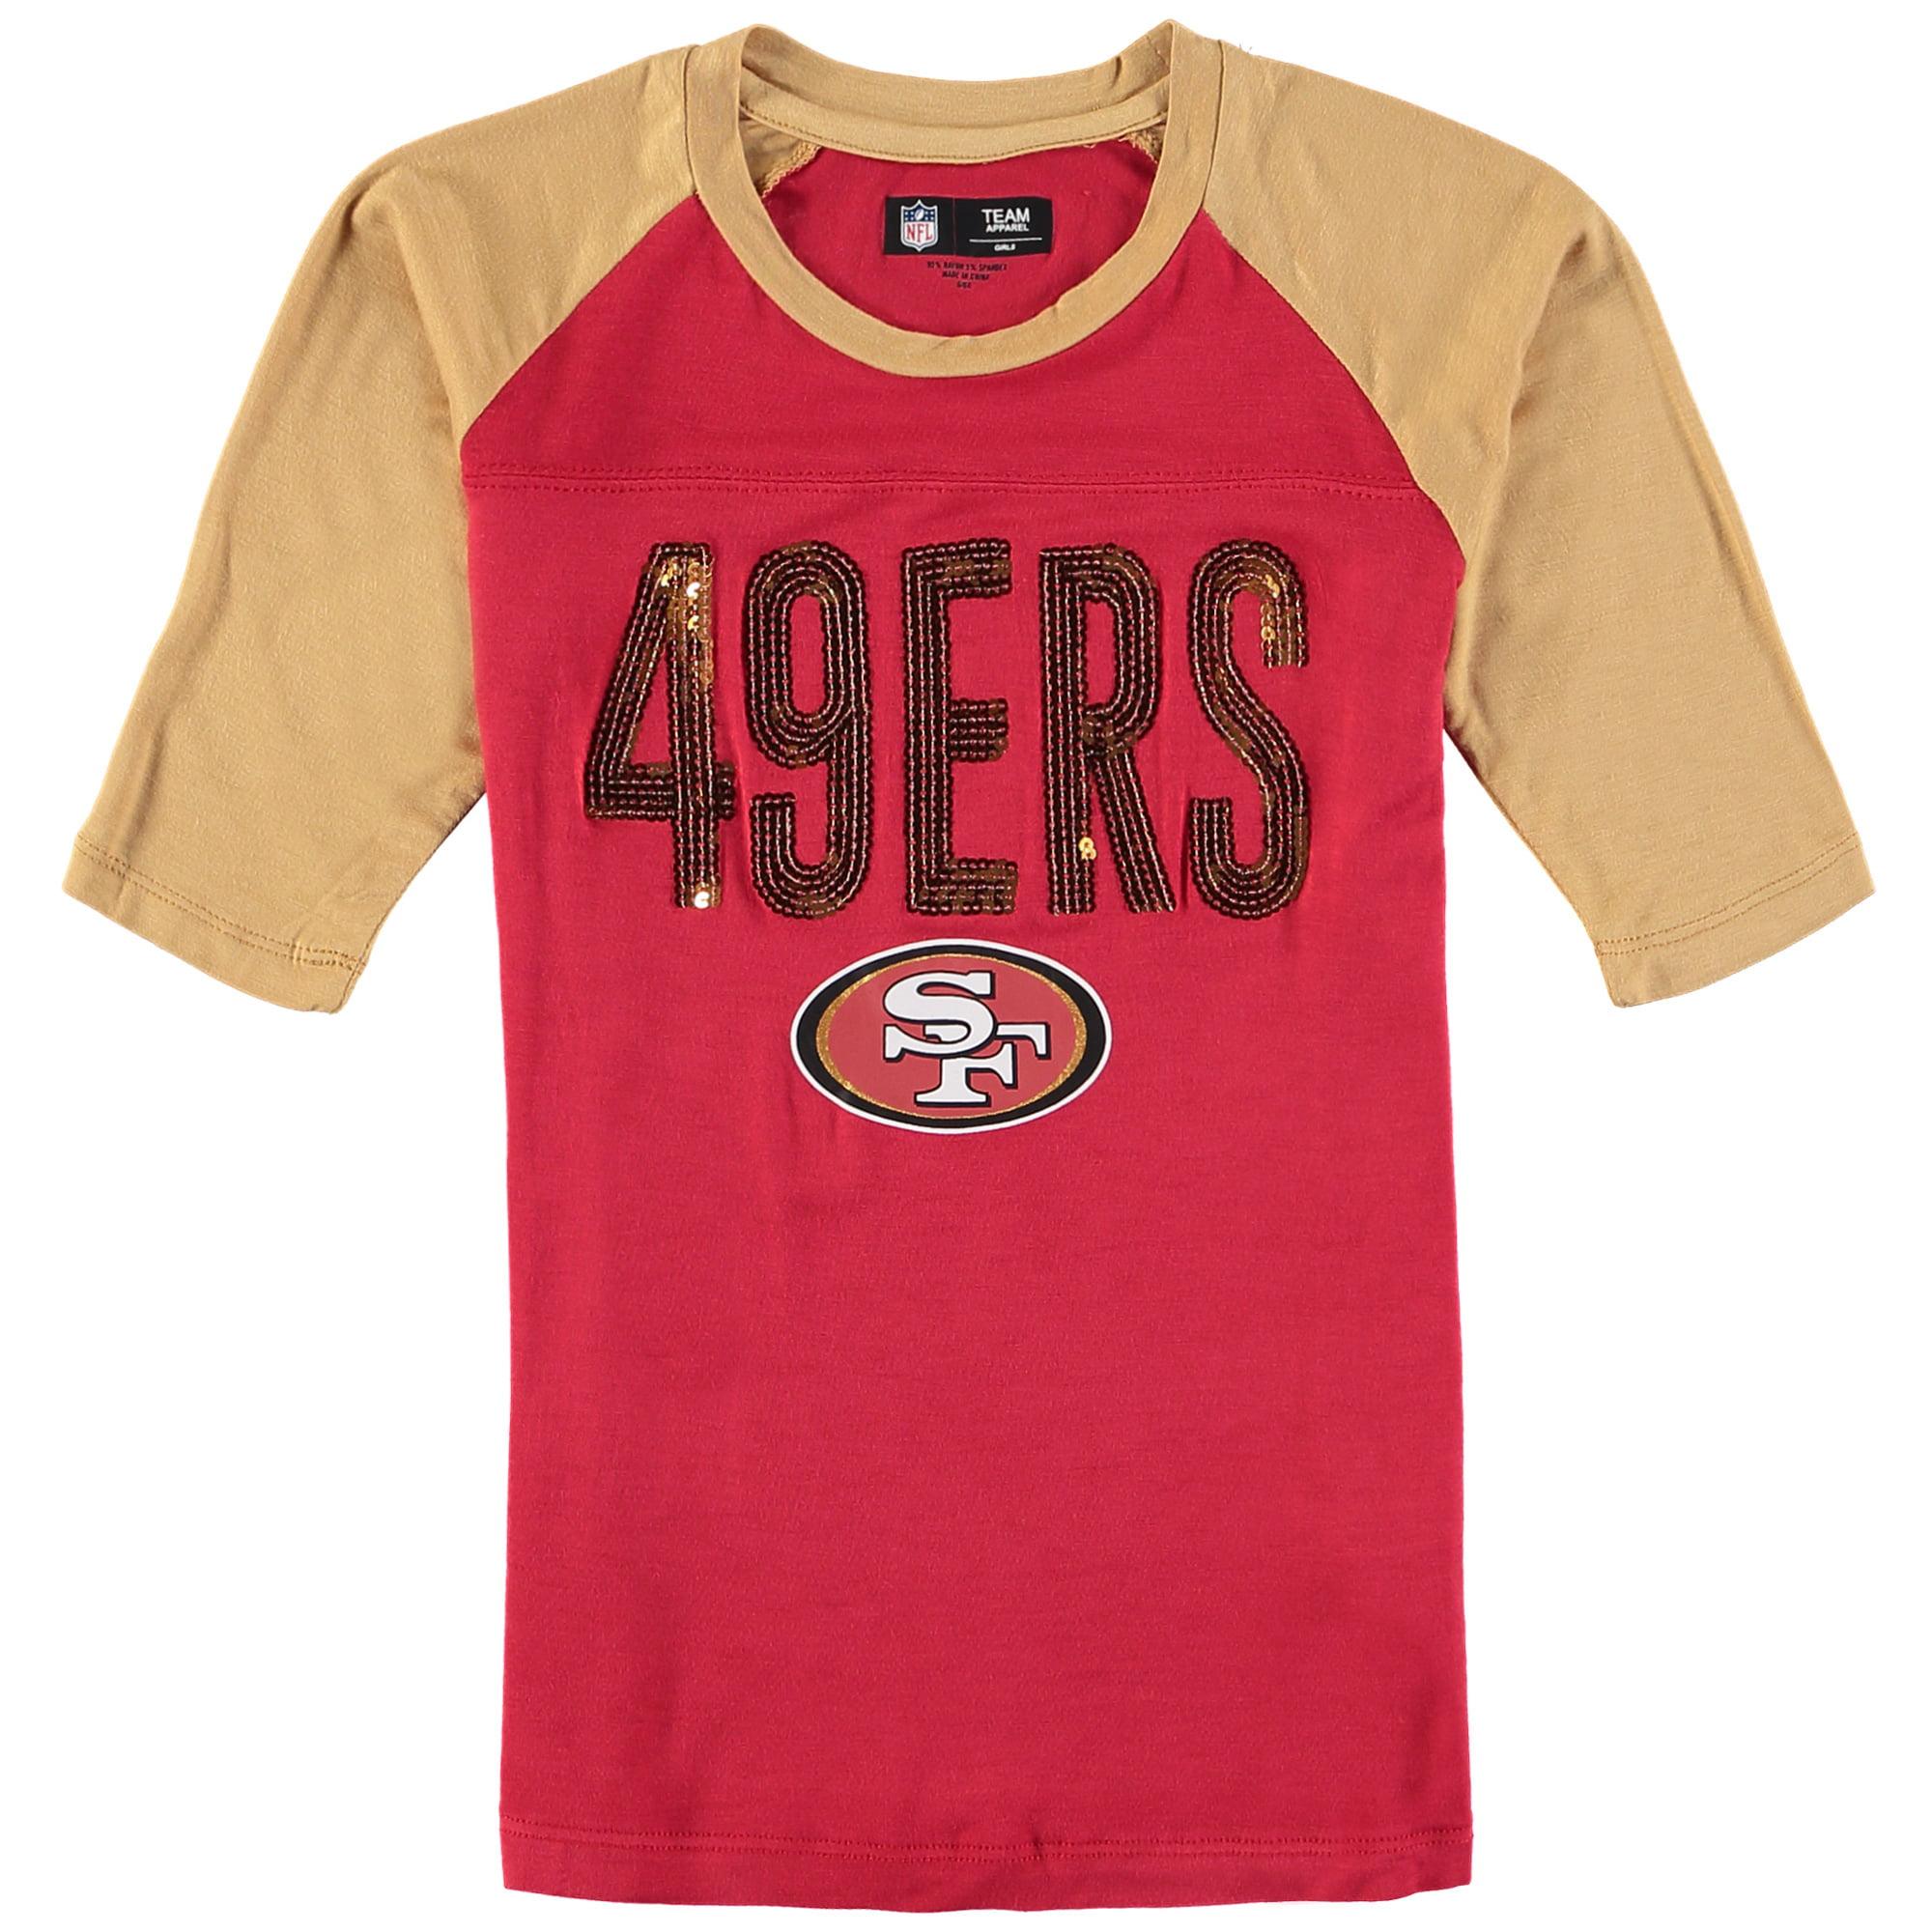 San Francisco 49ers Raglan Shirt Youth Girls Graphic Tee